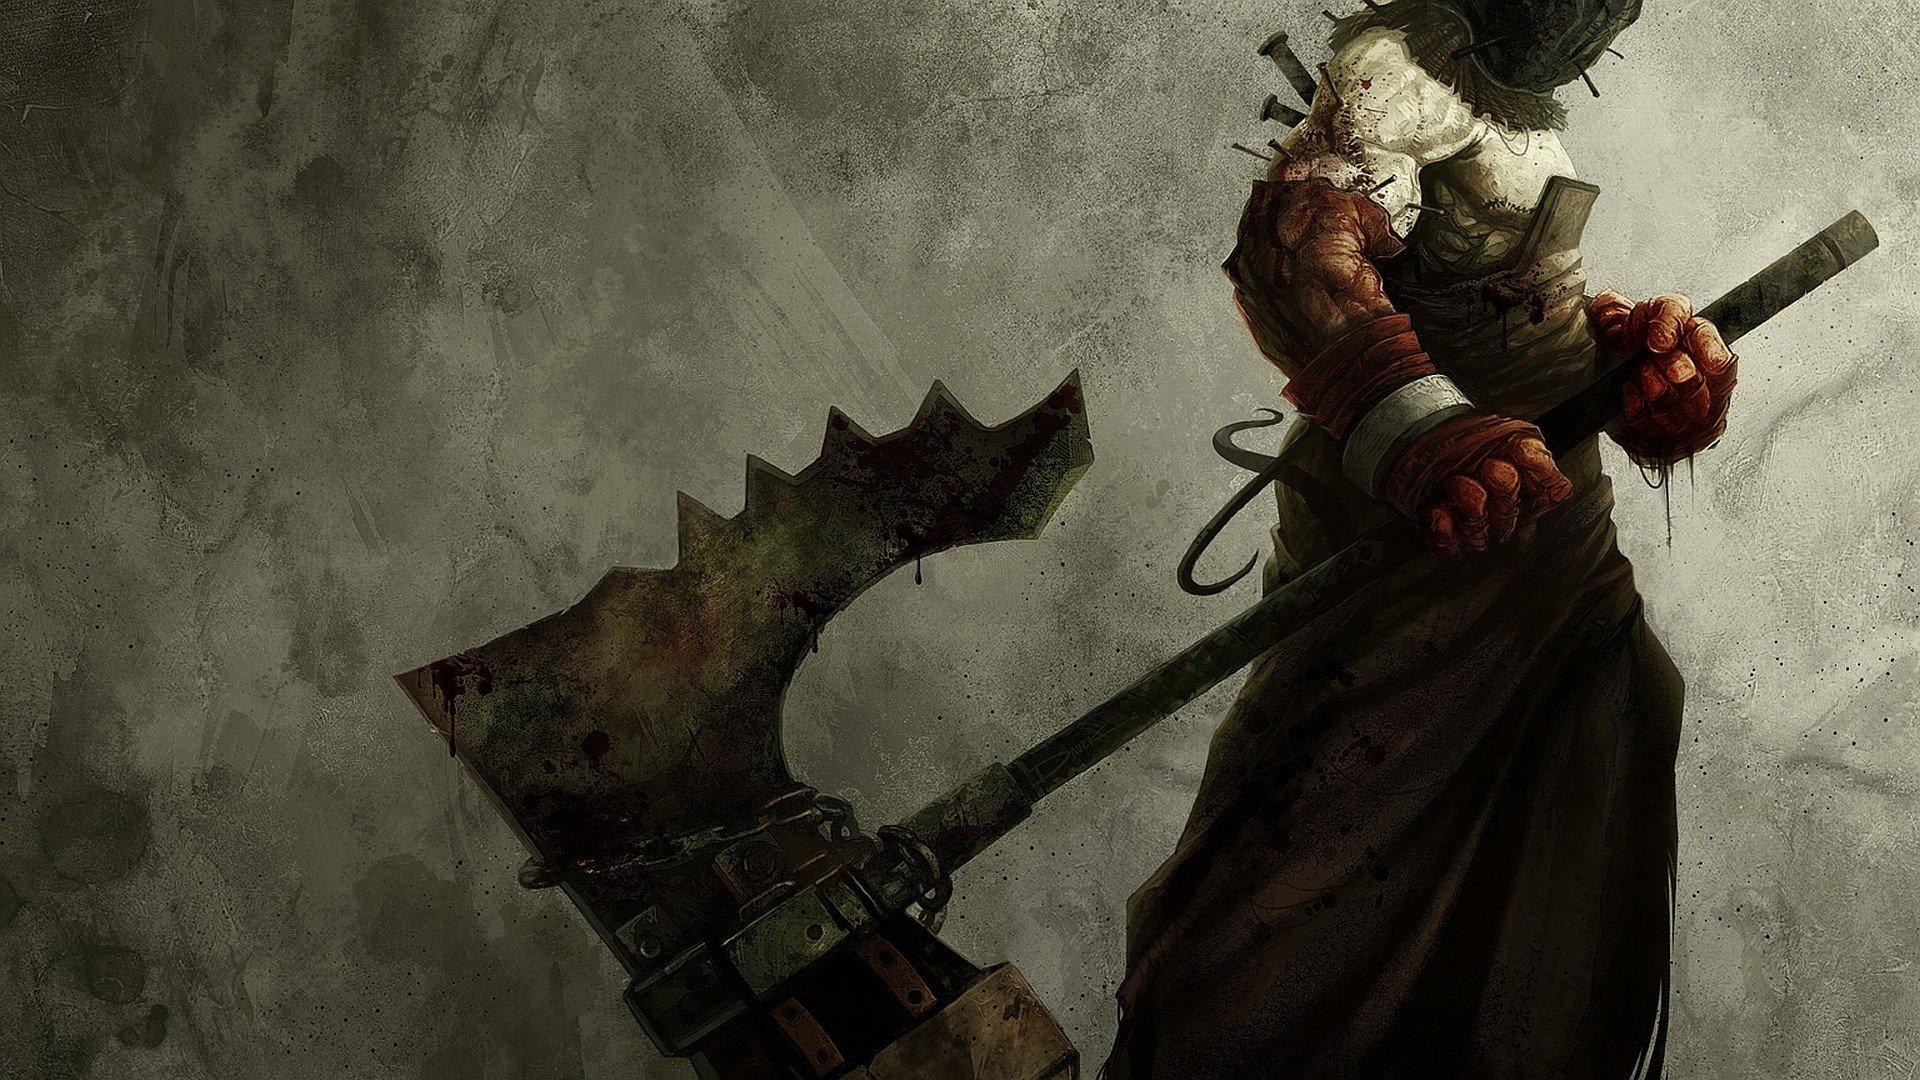 Wallpaper Gun Video Games Black Background Resident: Video Games Weapons Resident Evil 5 Wallpaper